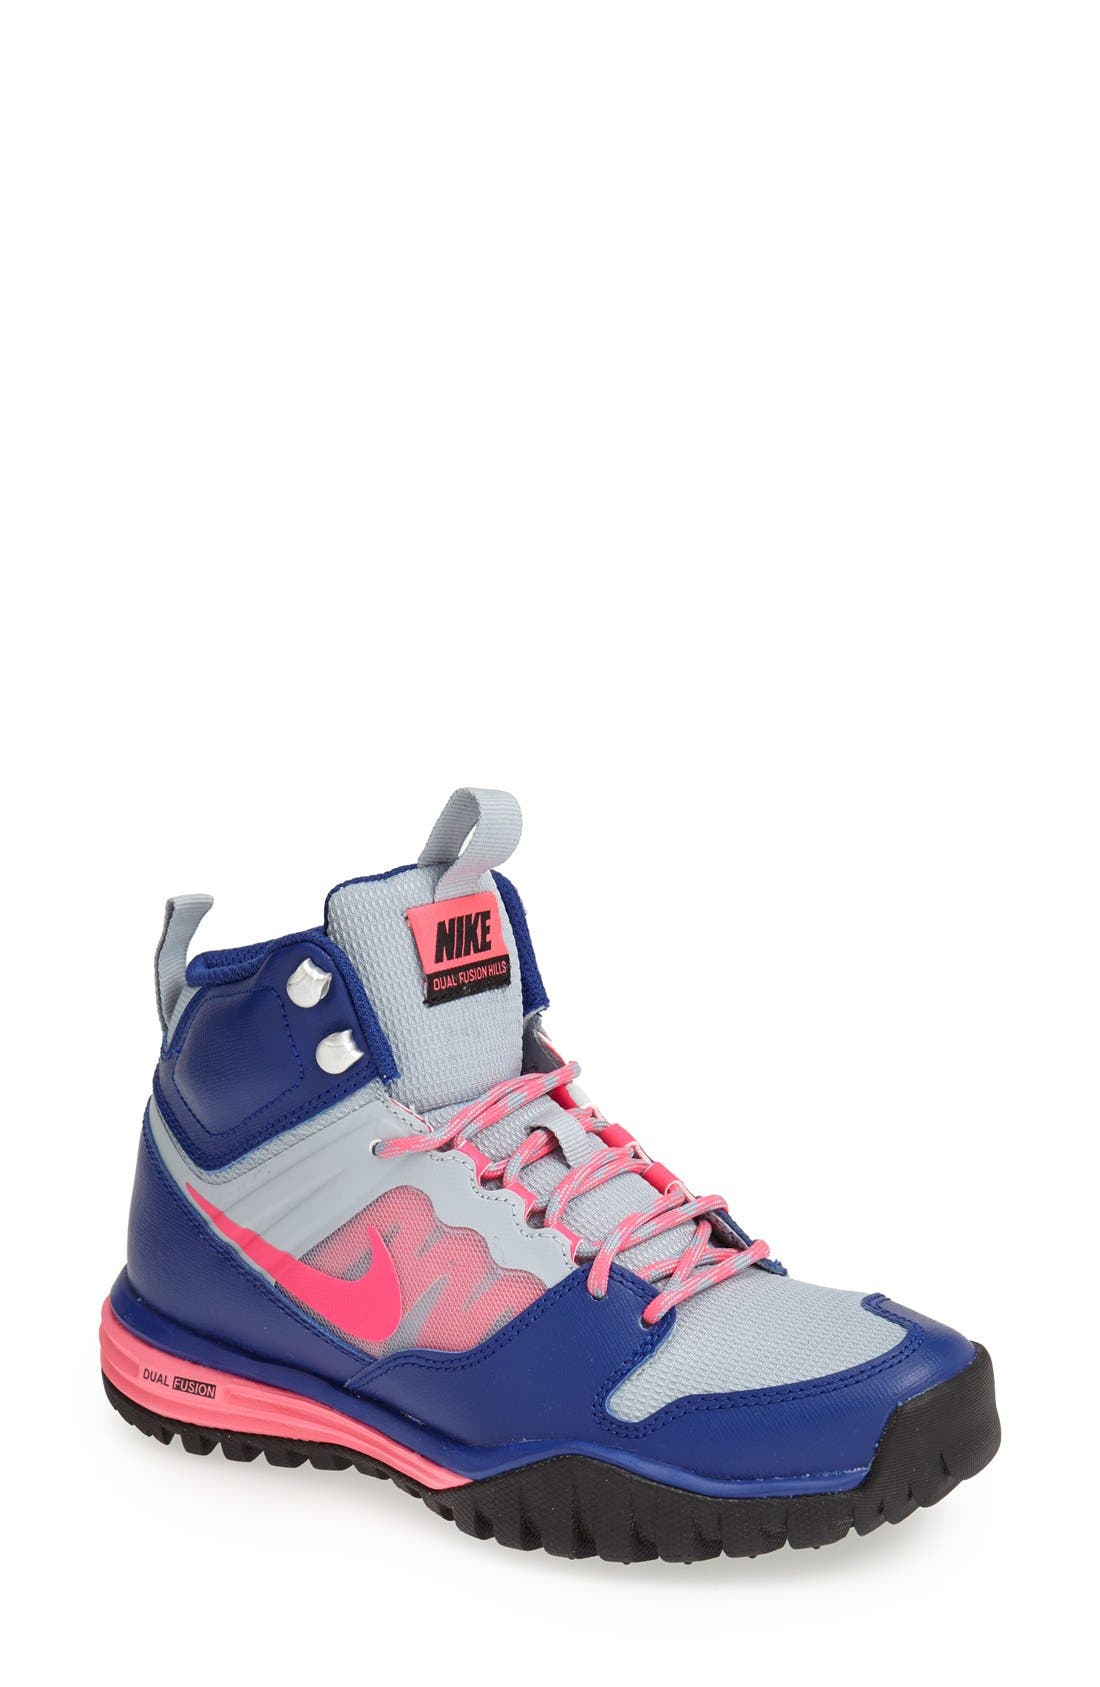 Alternate Image 1 Selected - Nike 'Dual Fusion Hills Mid' Walking Shoe (Women)